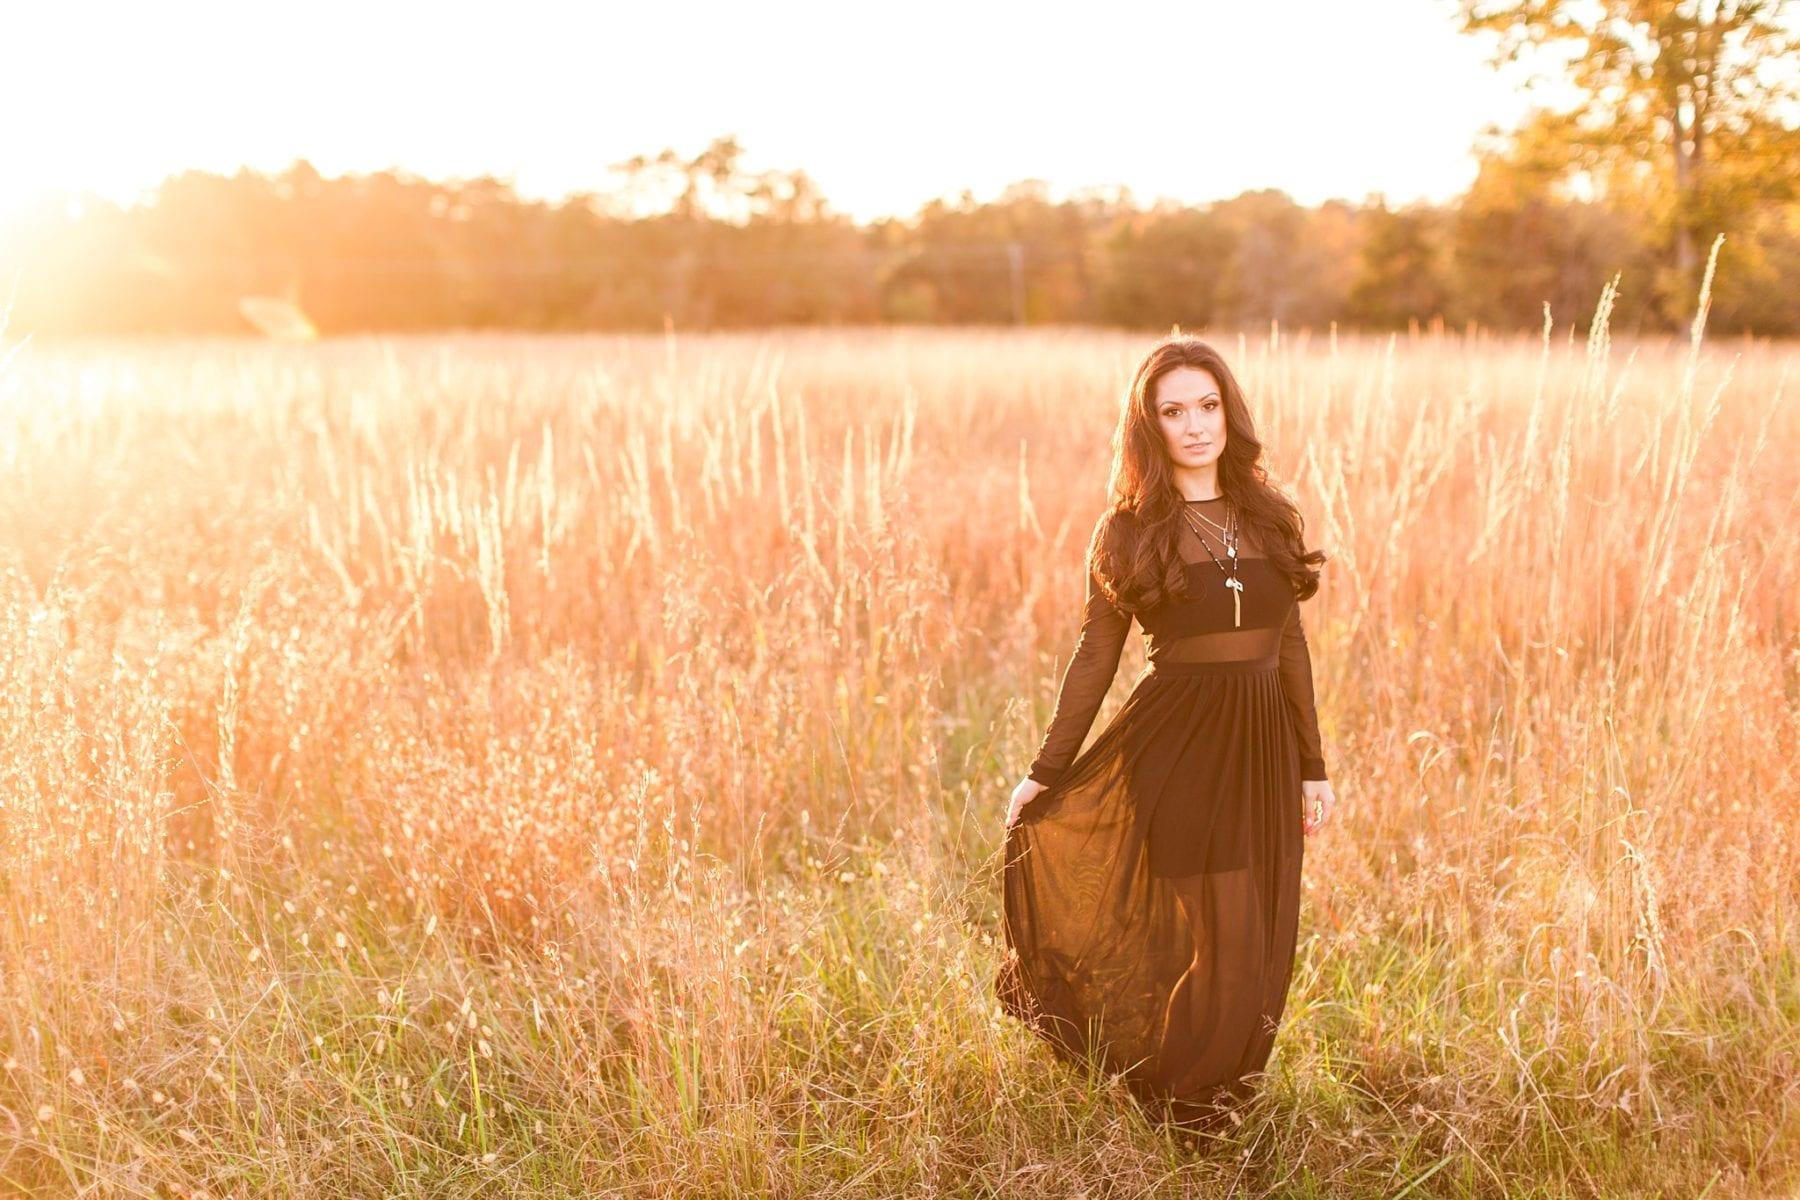 Manassas Battlefield Portraits Virginia Wedding Photographer Megan Kelsey Photography Lianne & Chris-257.jpg